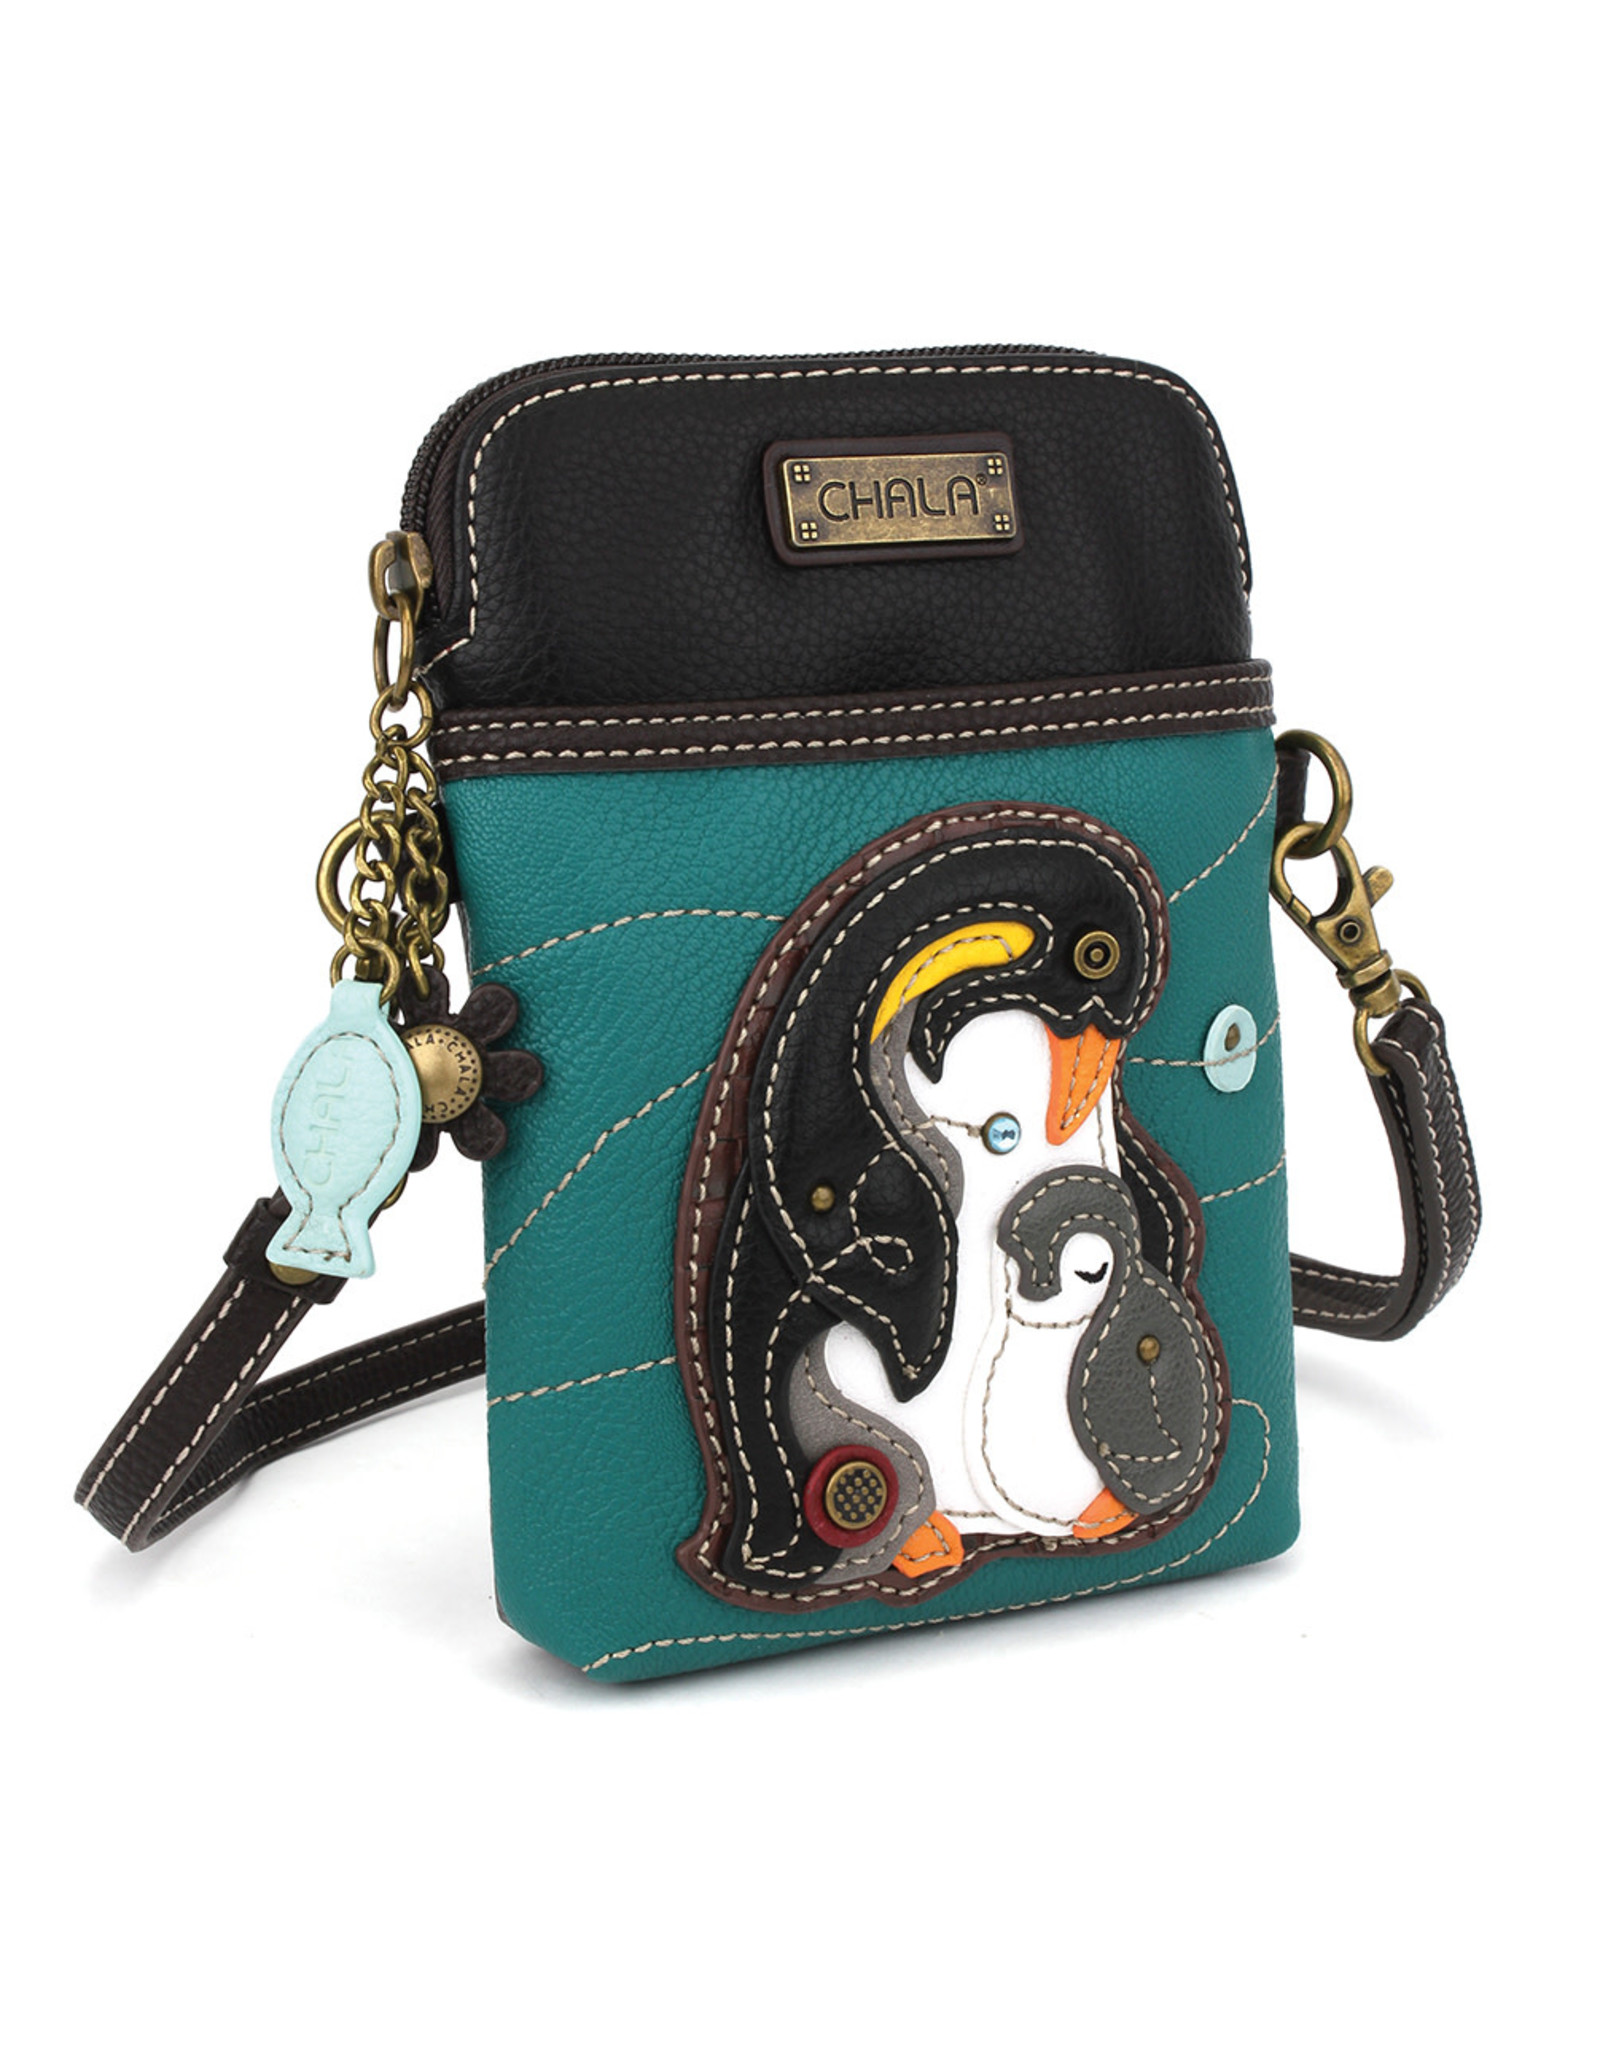 Chala Cell Phone Crossbody - Penguin